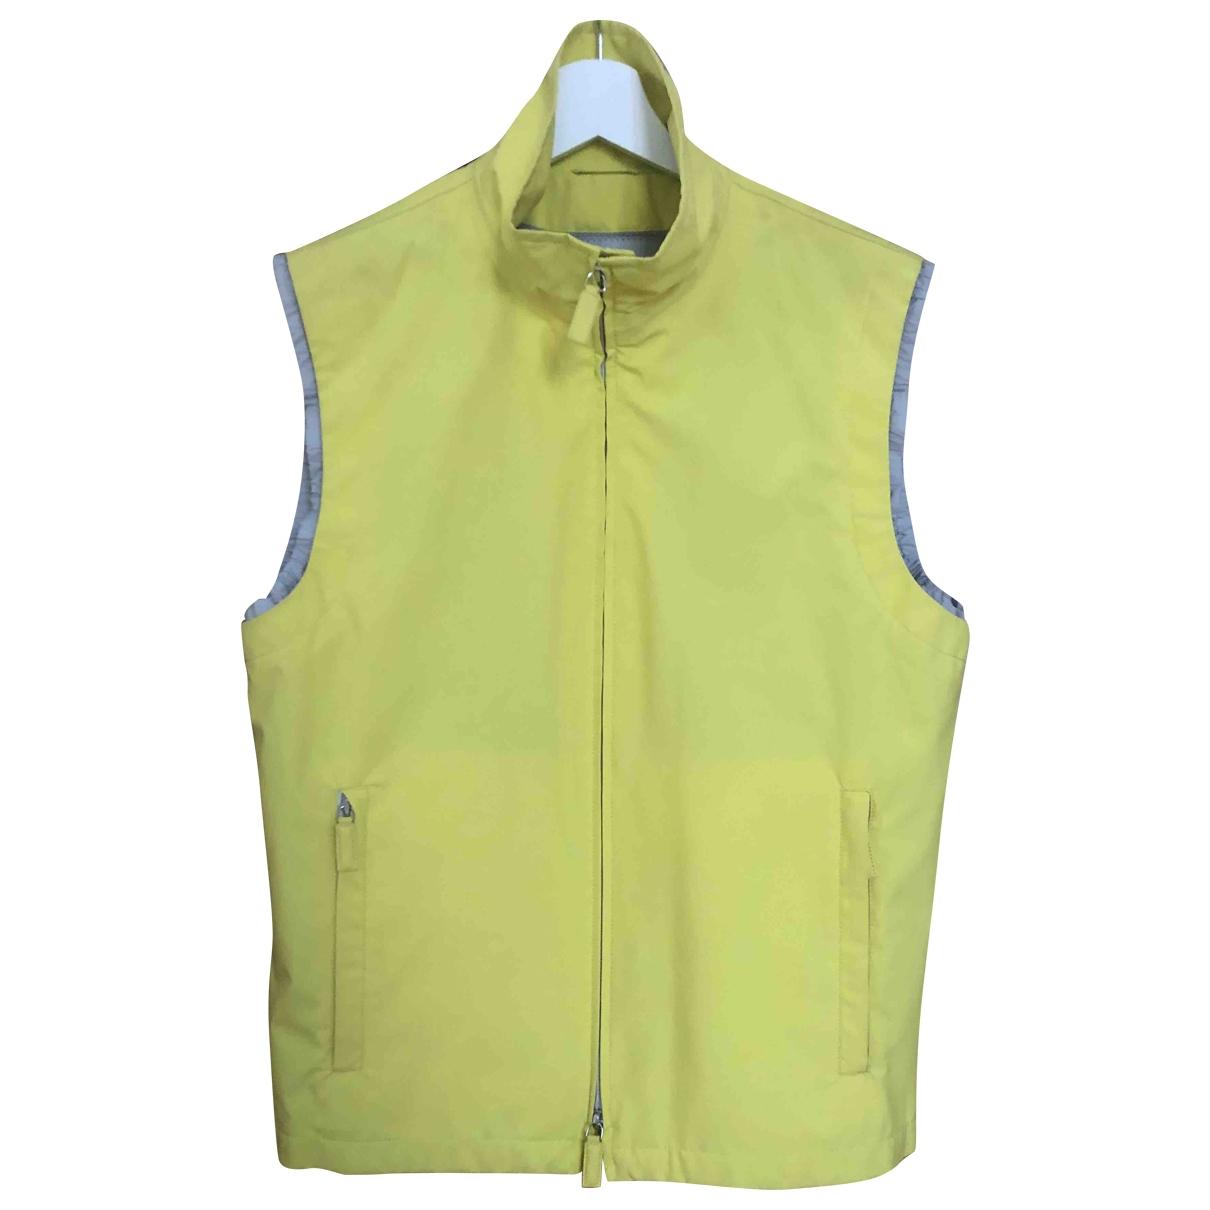 Prada \N Yellow jacket  for Men 48 IT